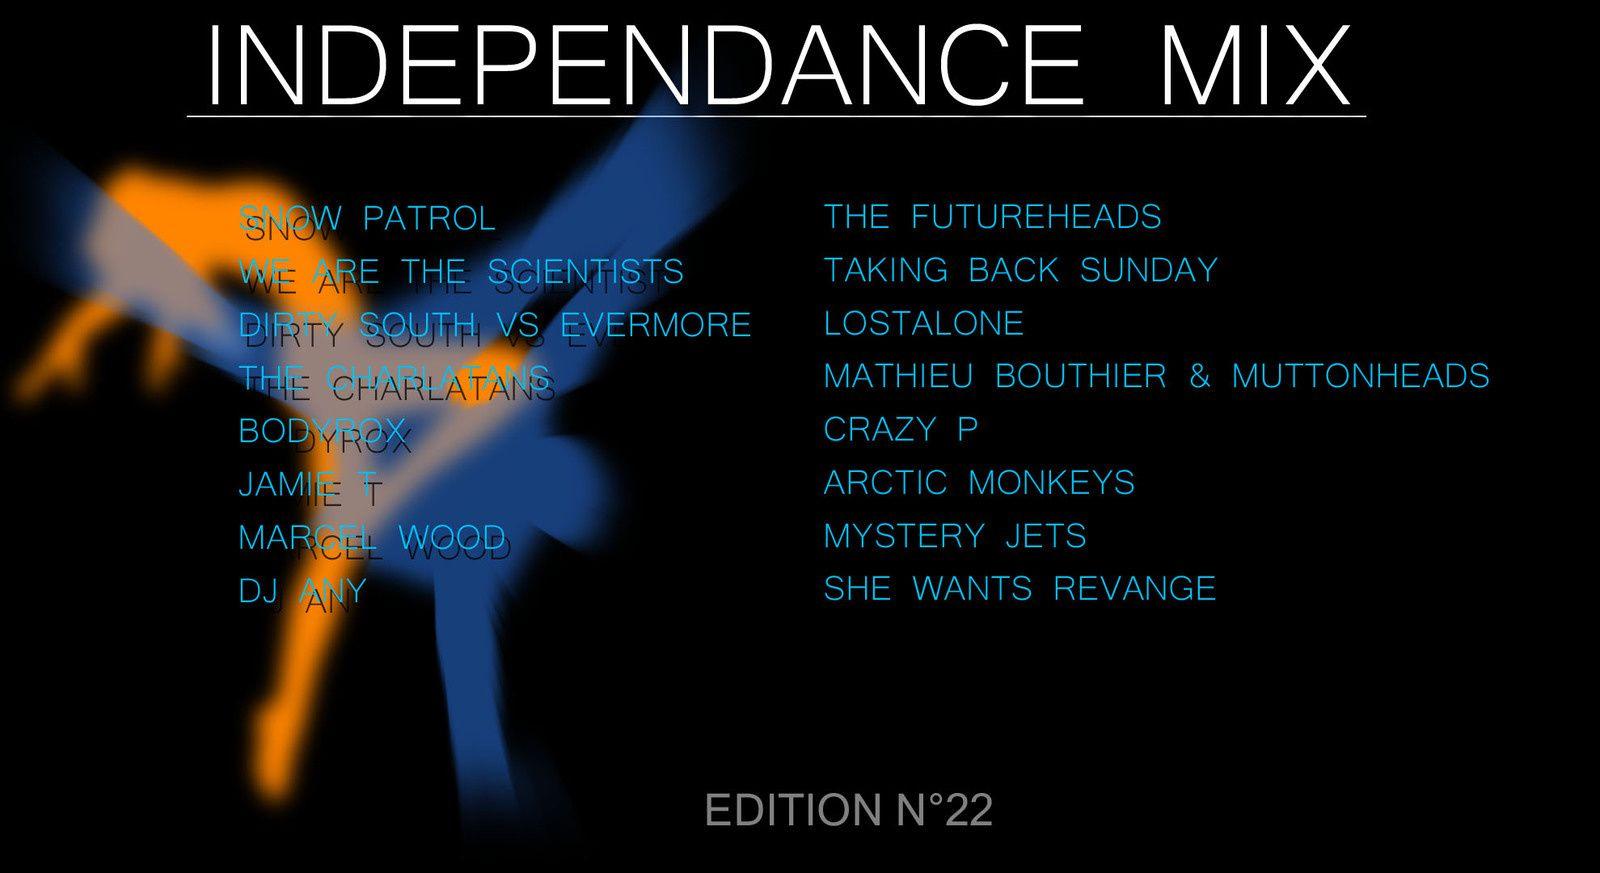 INDEPENDANCE MIX - Vidéoliste n°22